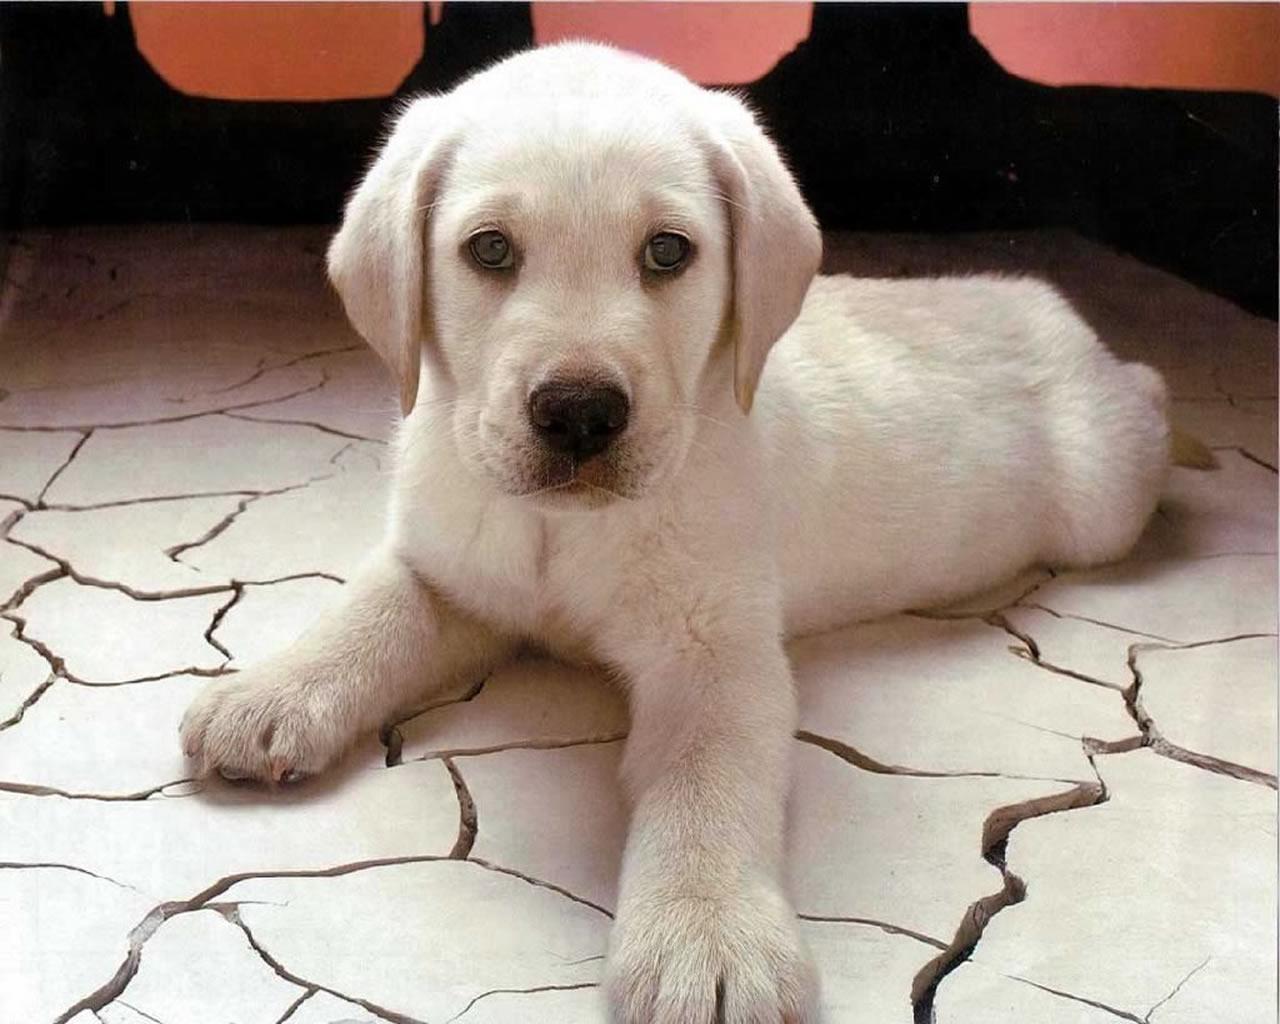 download wallpaper: puppy wallpaper